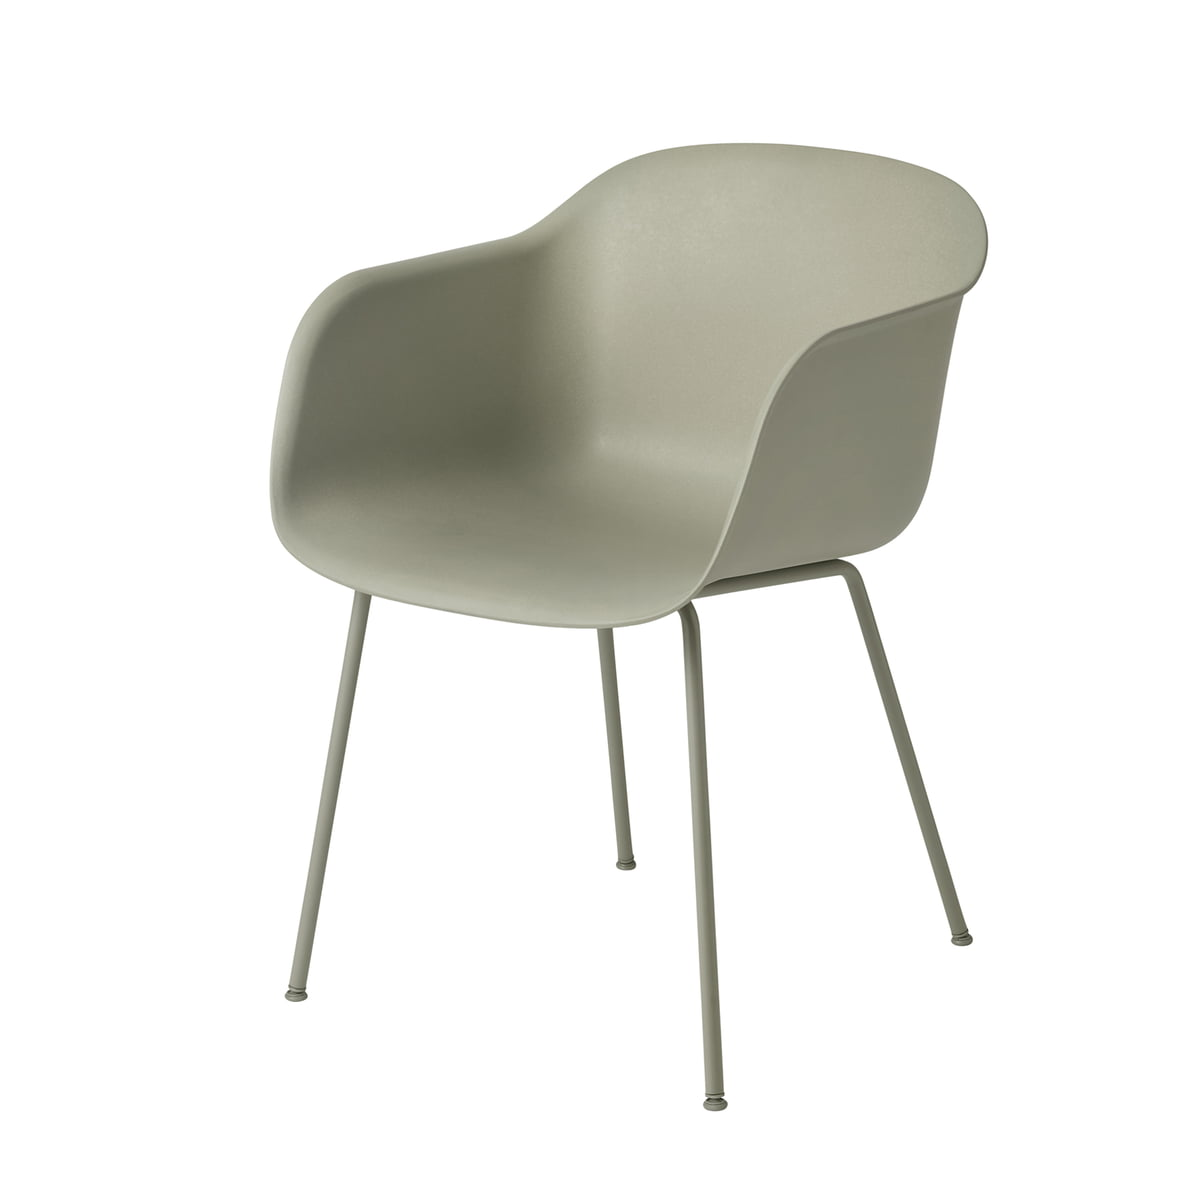 Pleasant Muuto Fiber Chair Tube Base White White Beatyapartments Chair Design Images Beatyapartmentscom